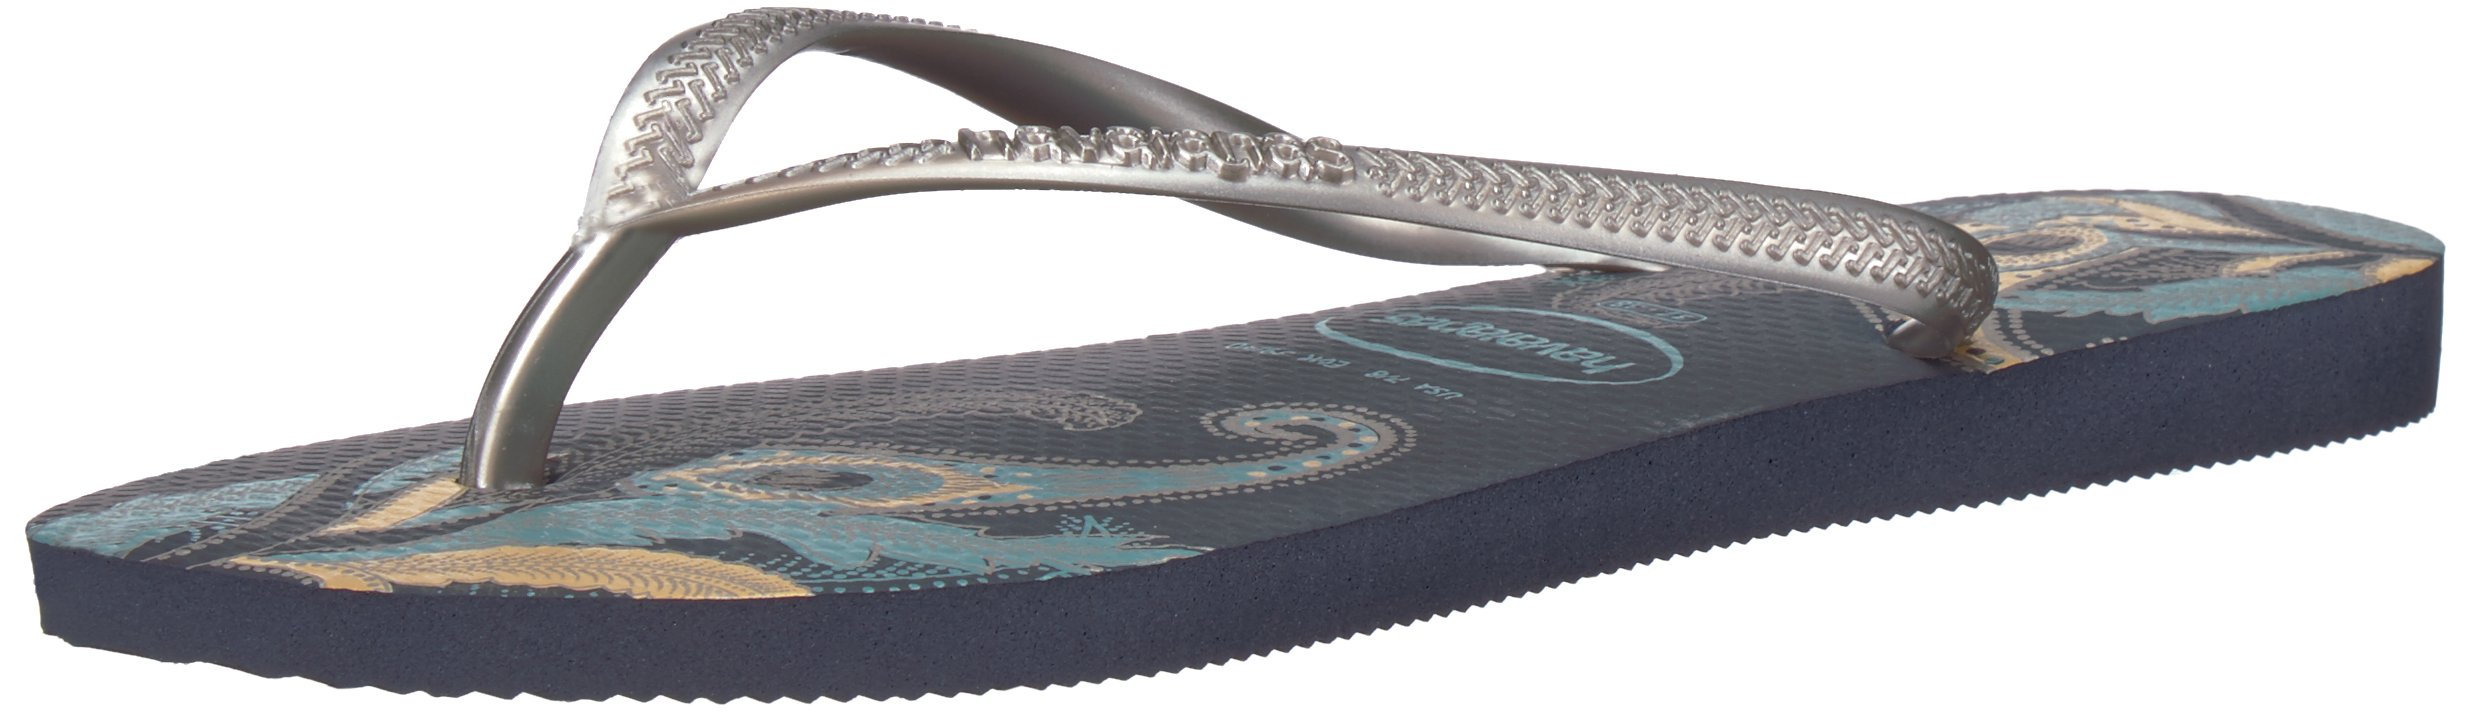 Havaianas Women's Slim Organic Flip Flop Sandals, Floral Design, Navy Blue/Silver, 37/38 BR (7-8 M US)